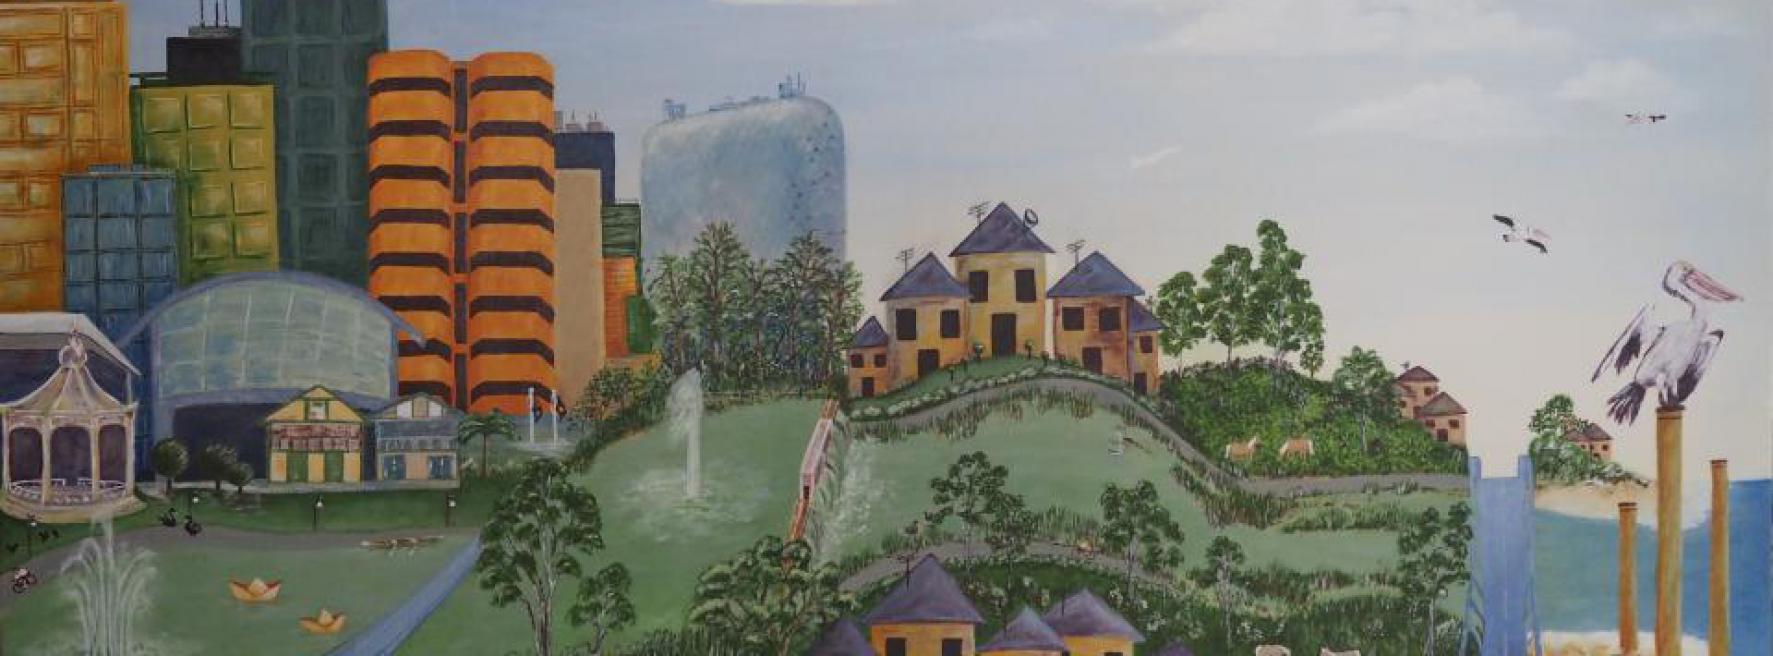 west torrens art prize.jpg